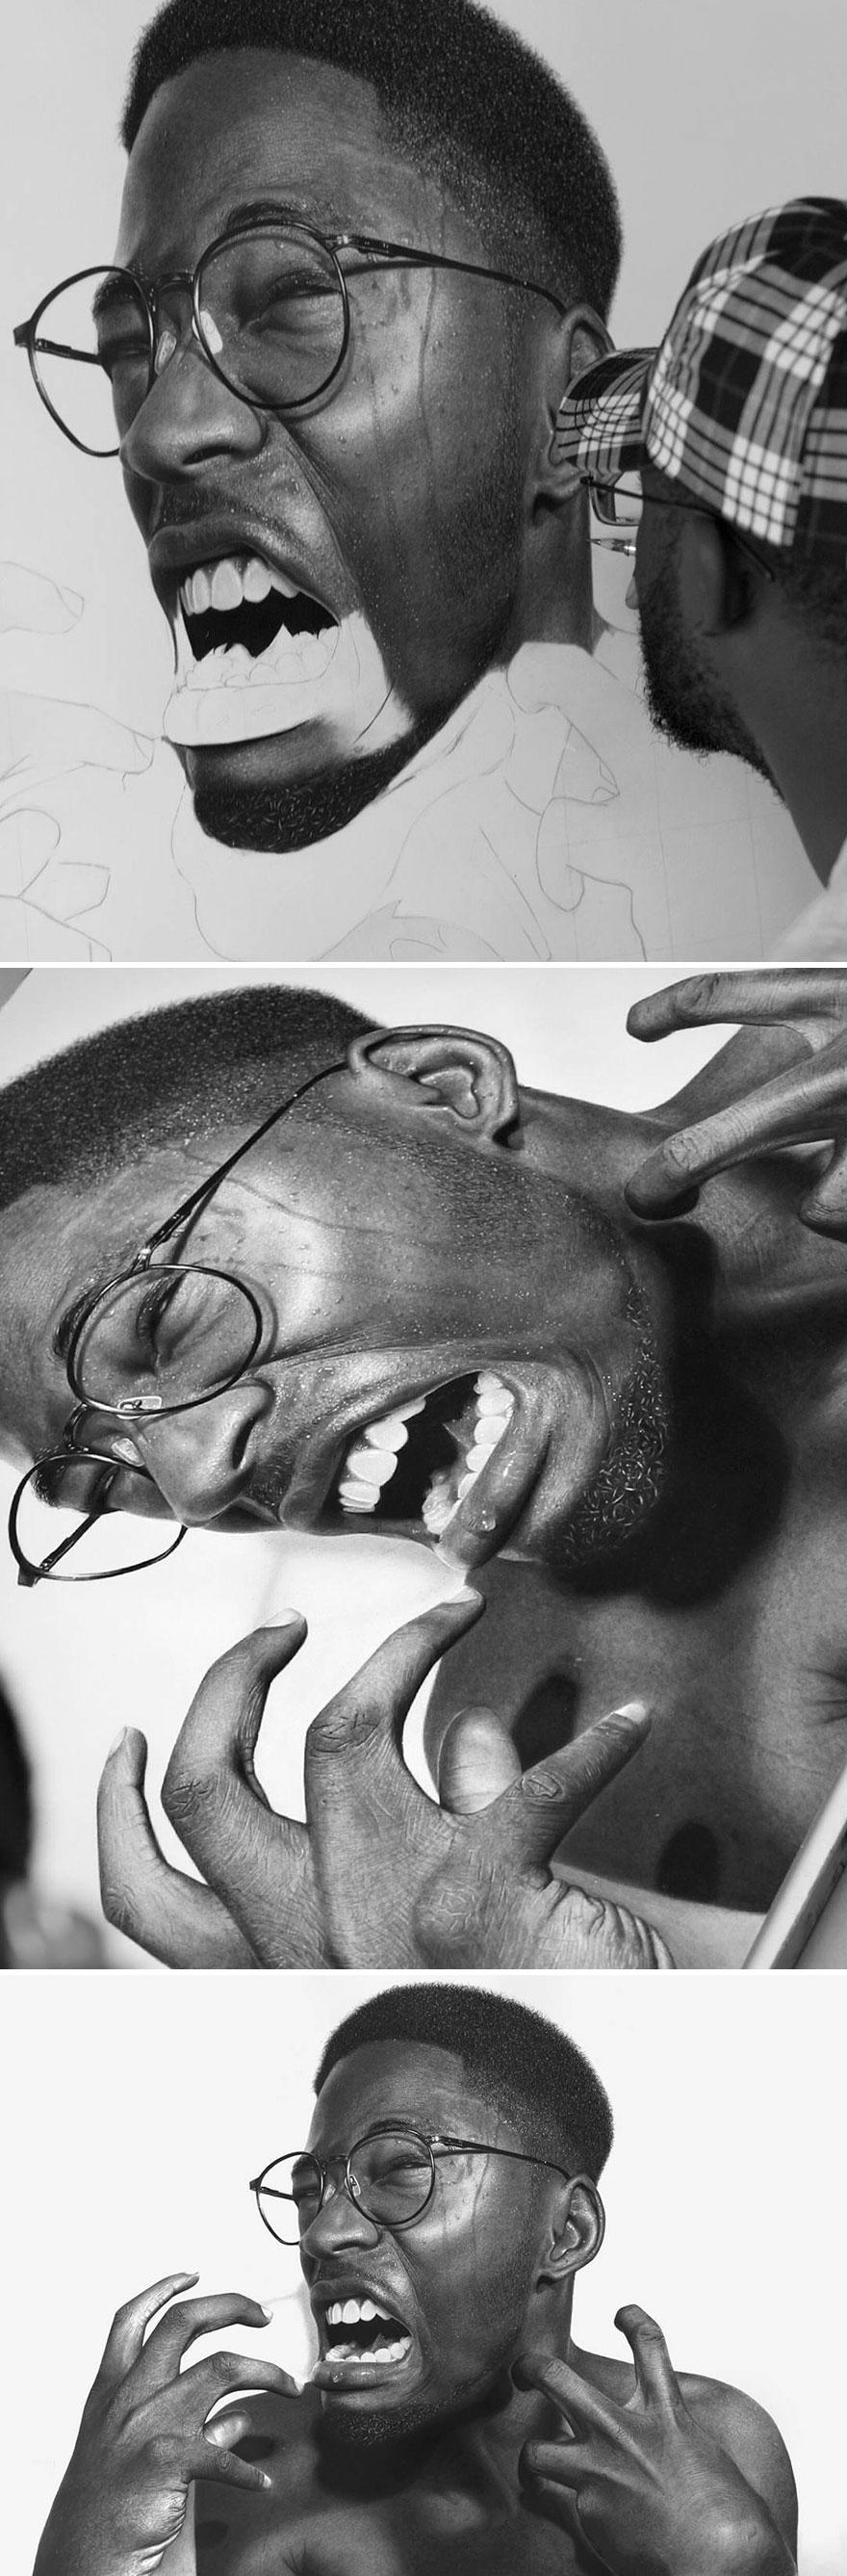 retrato-desenho-04